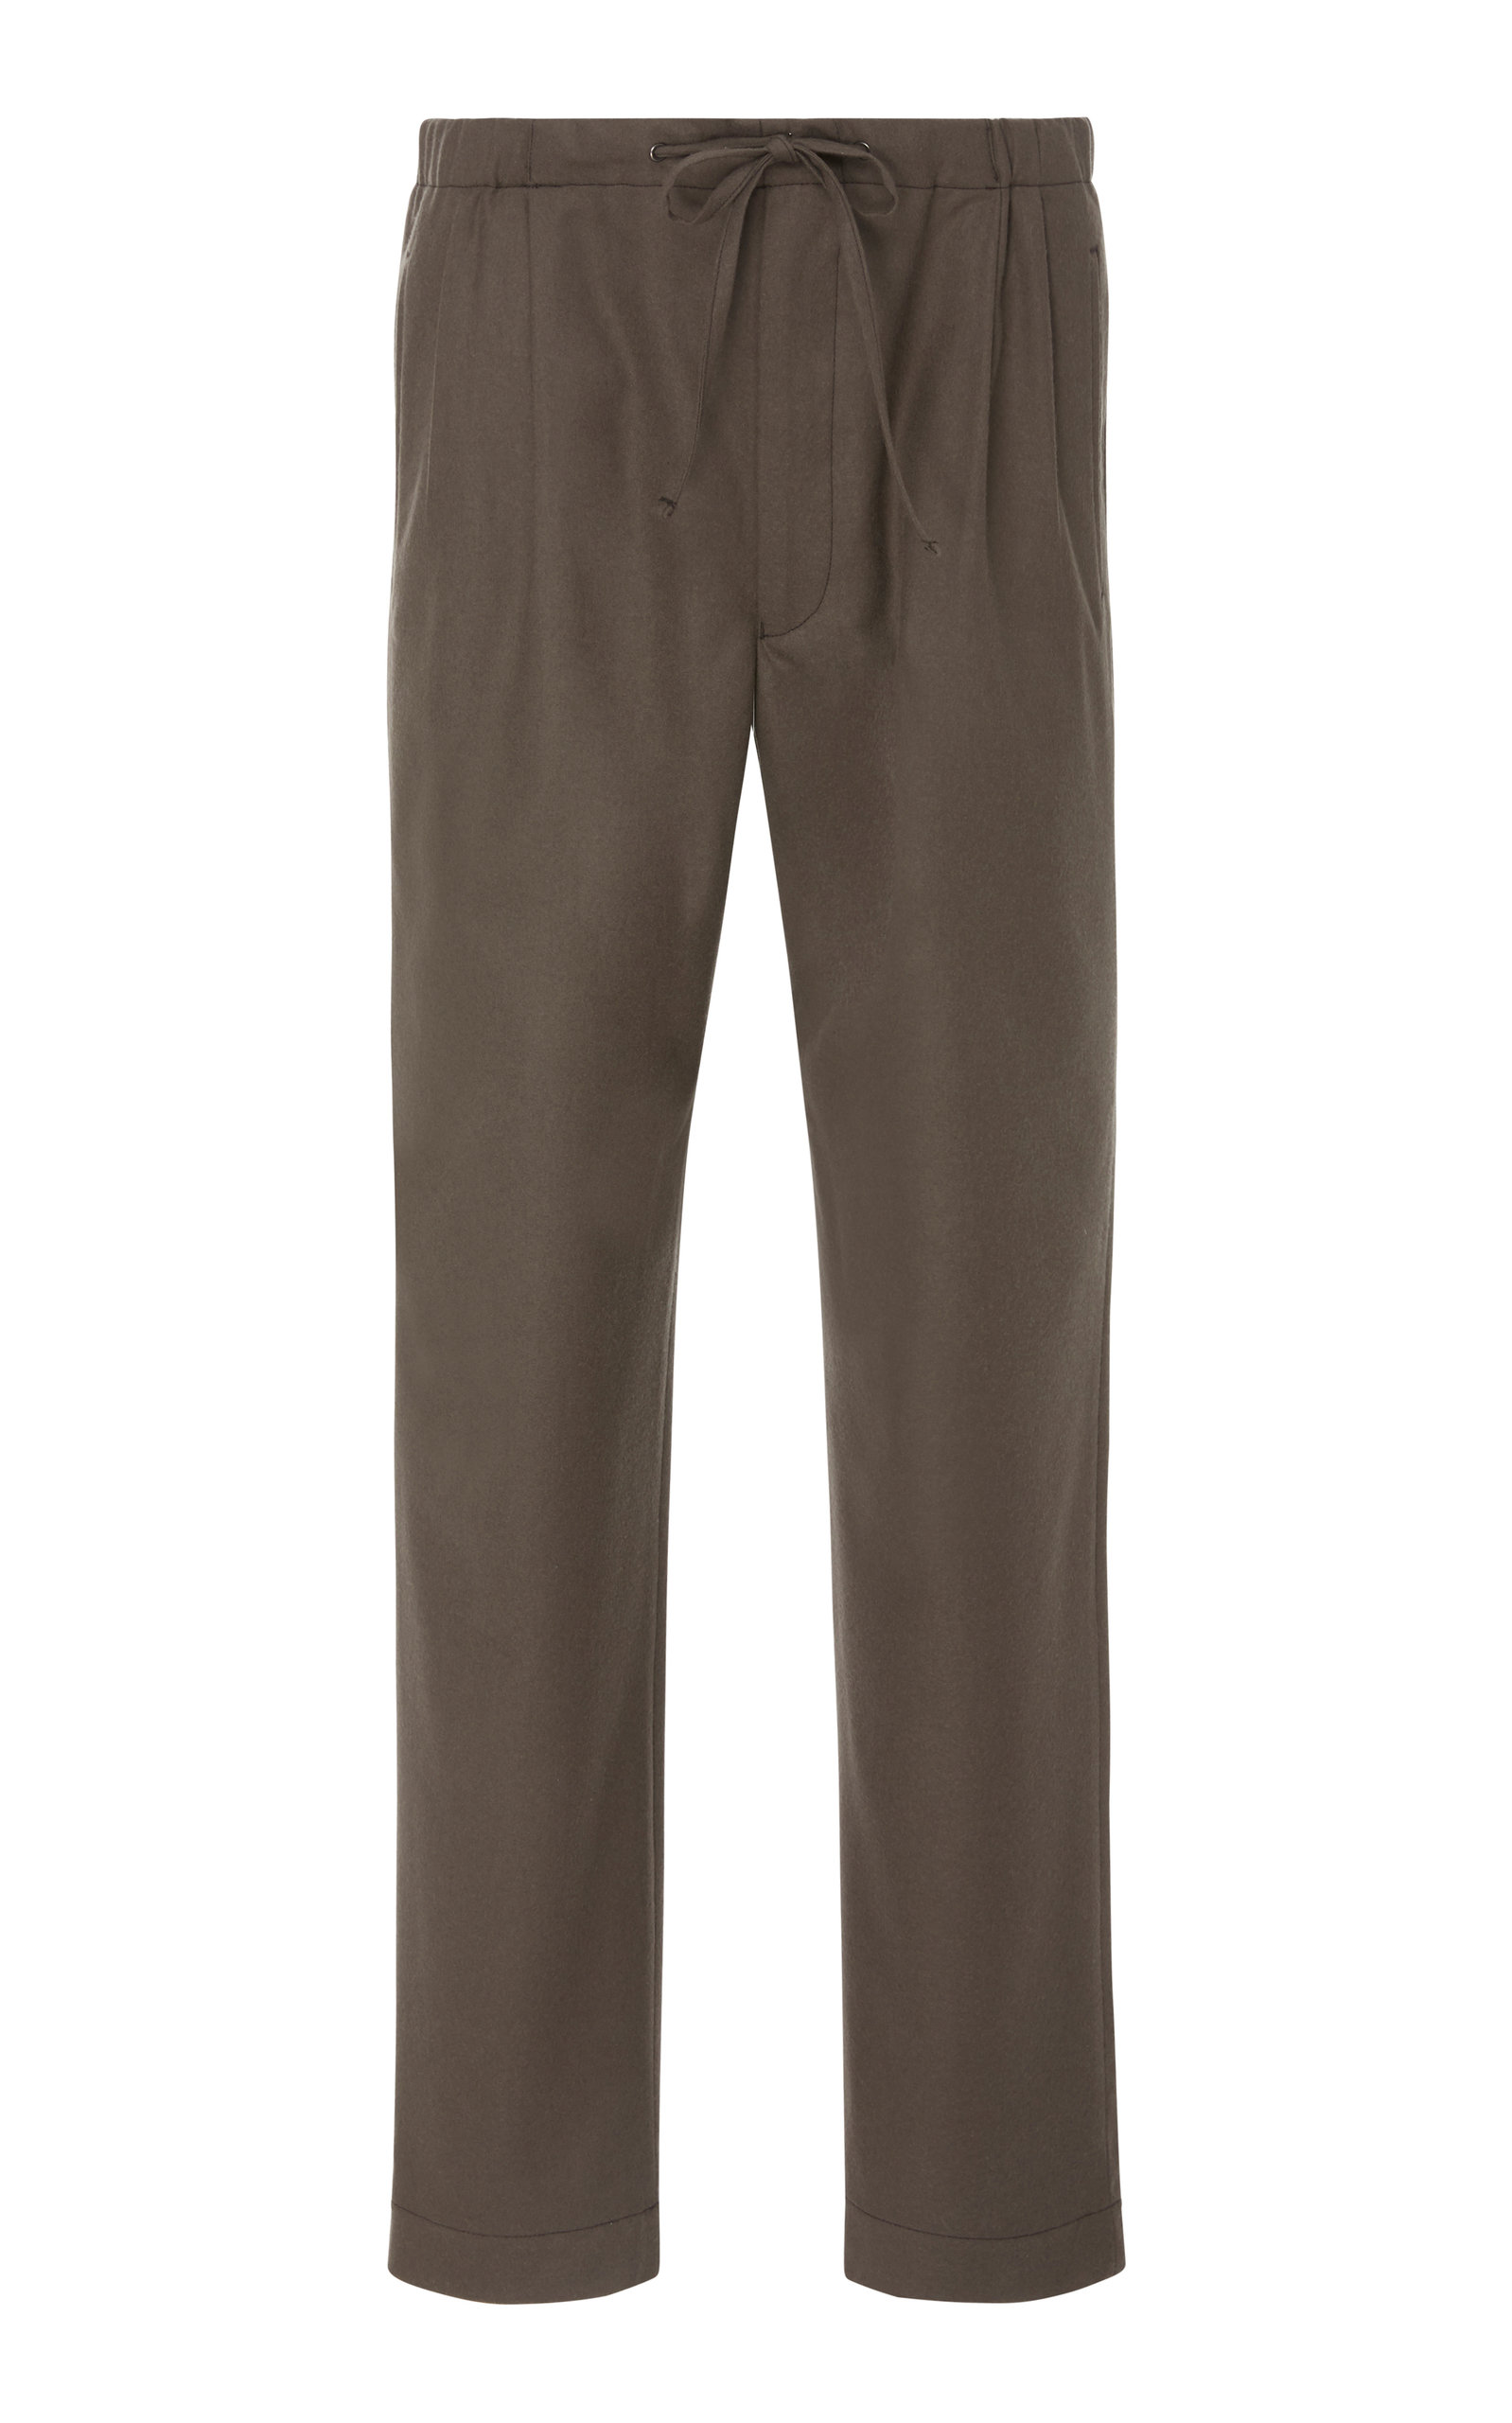 CAMOSHITA Pleated Drawstring Trousers in Grey